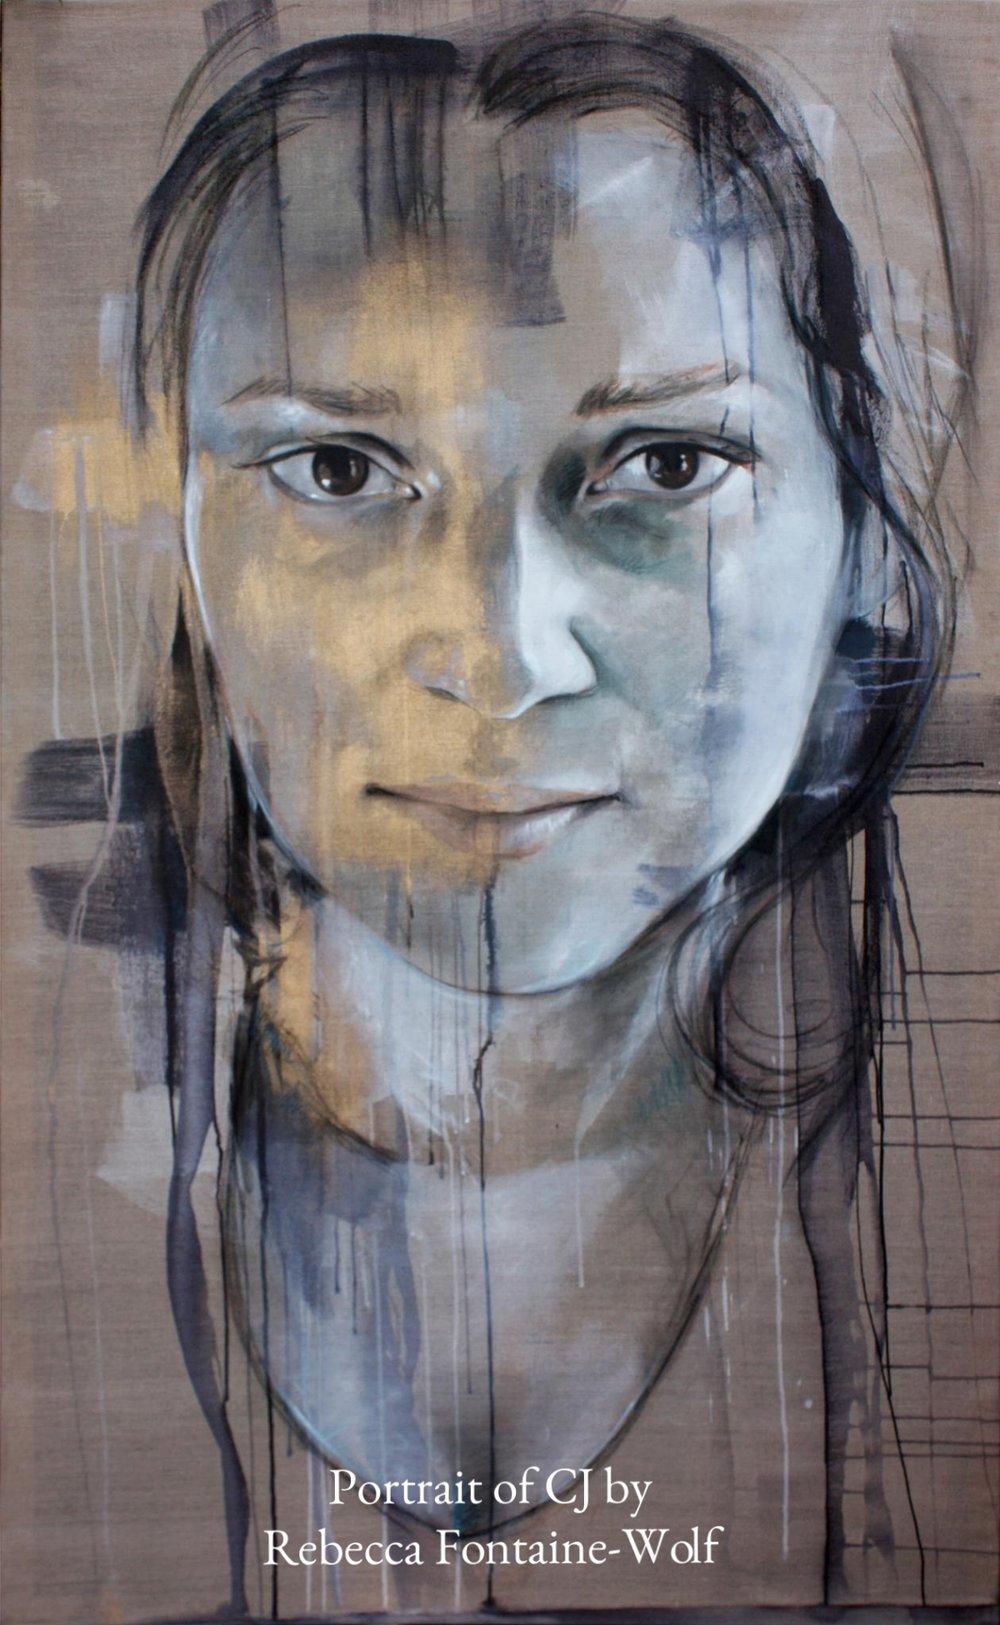 Portrait of CJ Munn by Rebecca Fontaine-Wolf